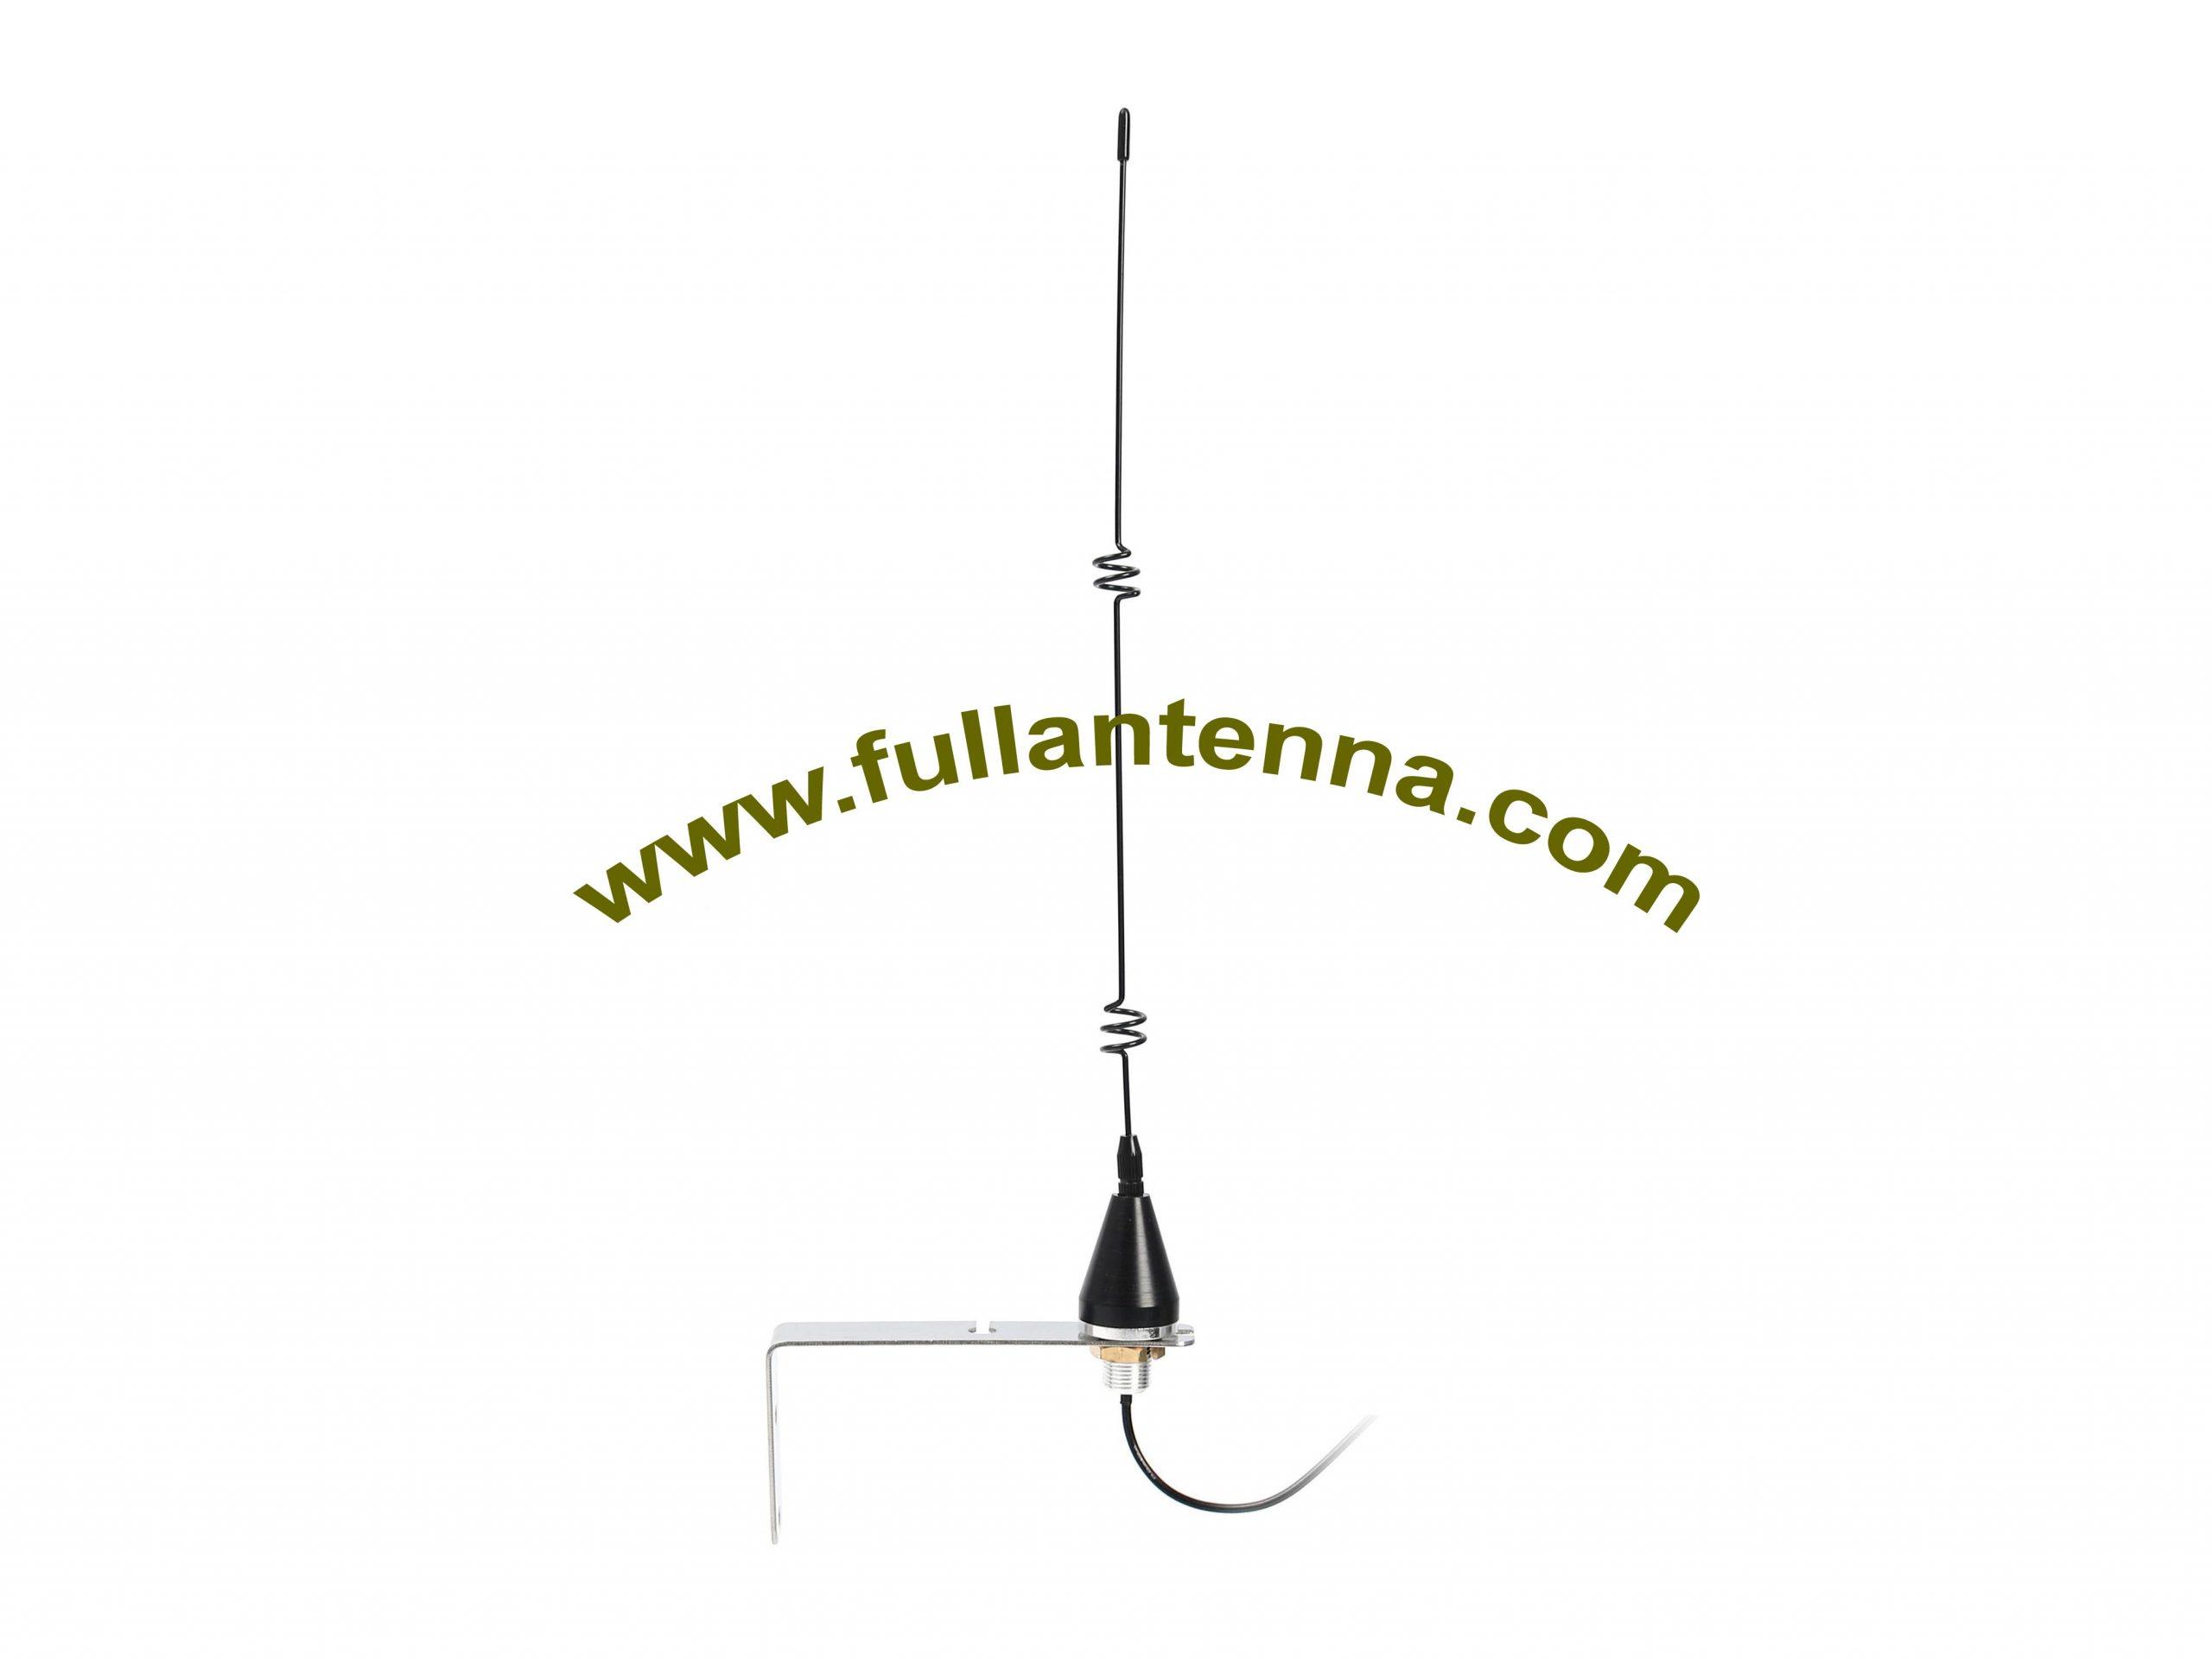 P/N:FA3G.0604,3G External Antenna,3G wall mount  indoor antenna  5dbi gain high quality